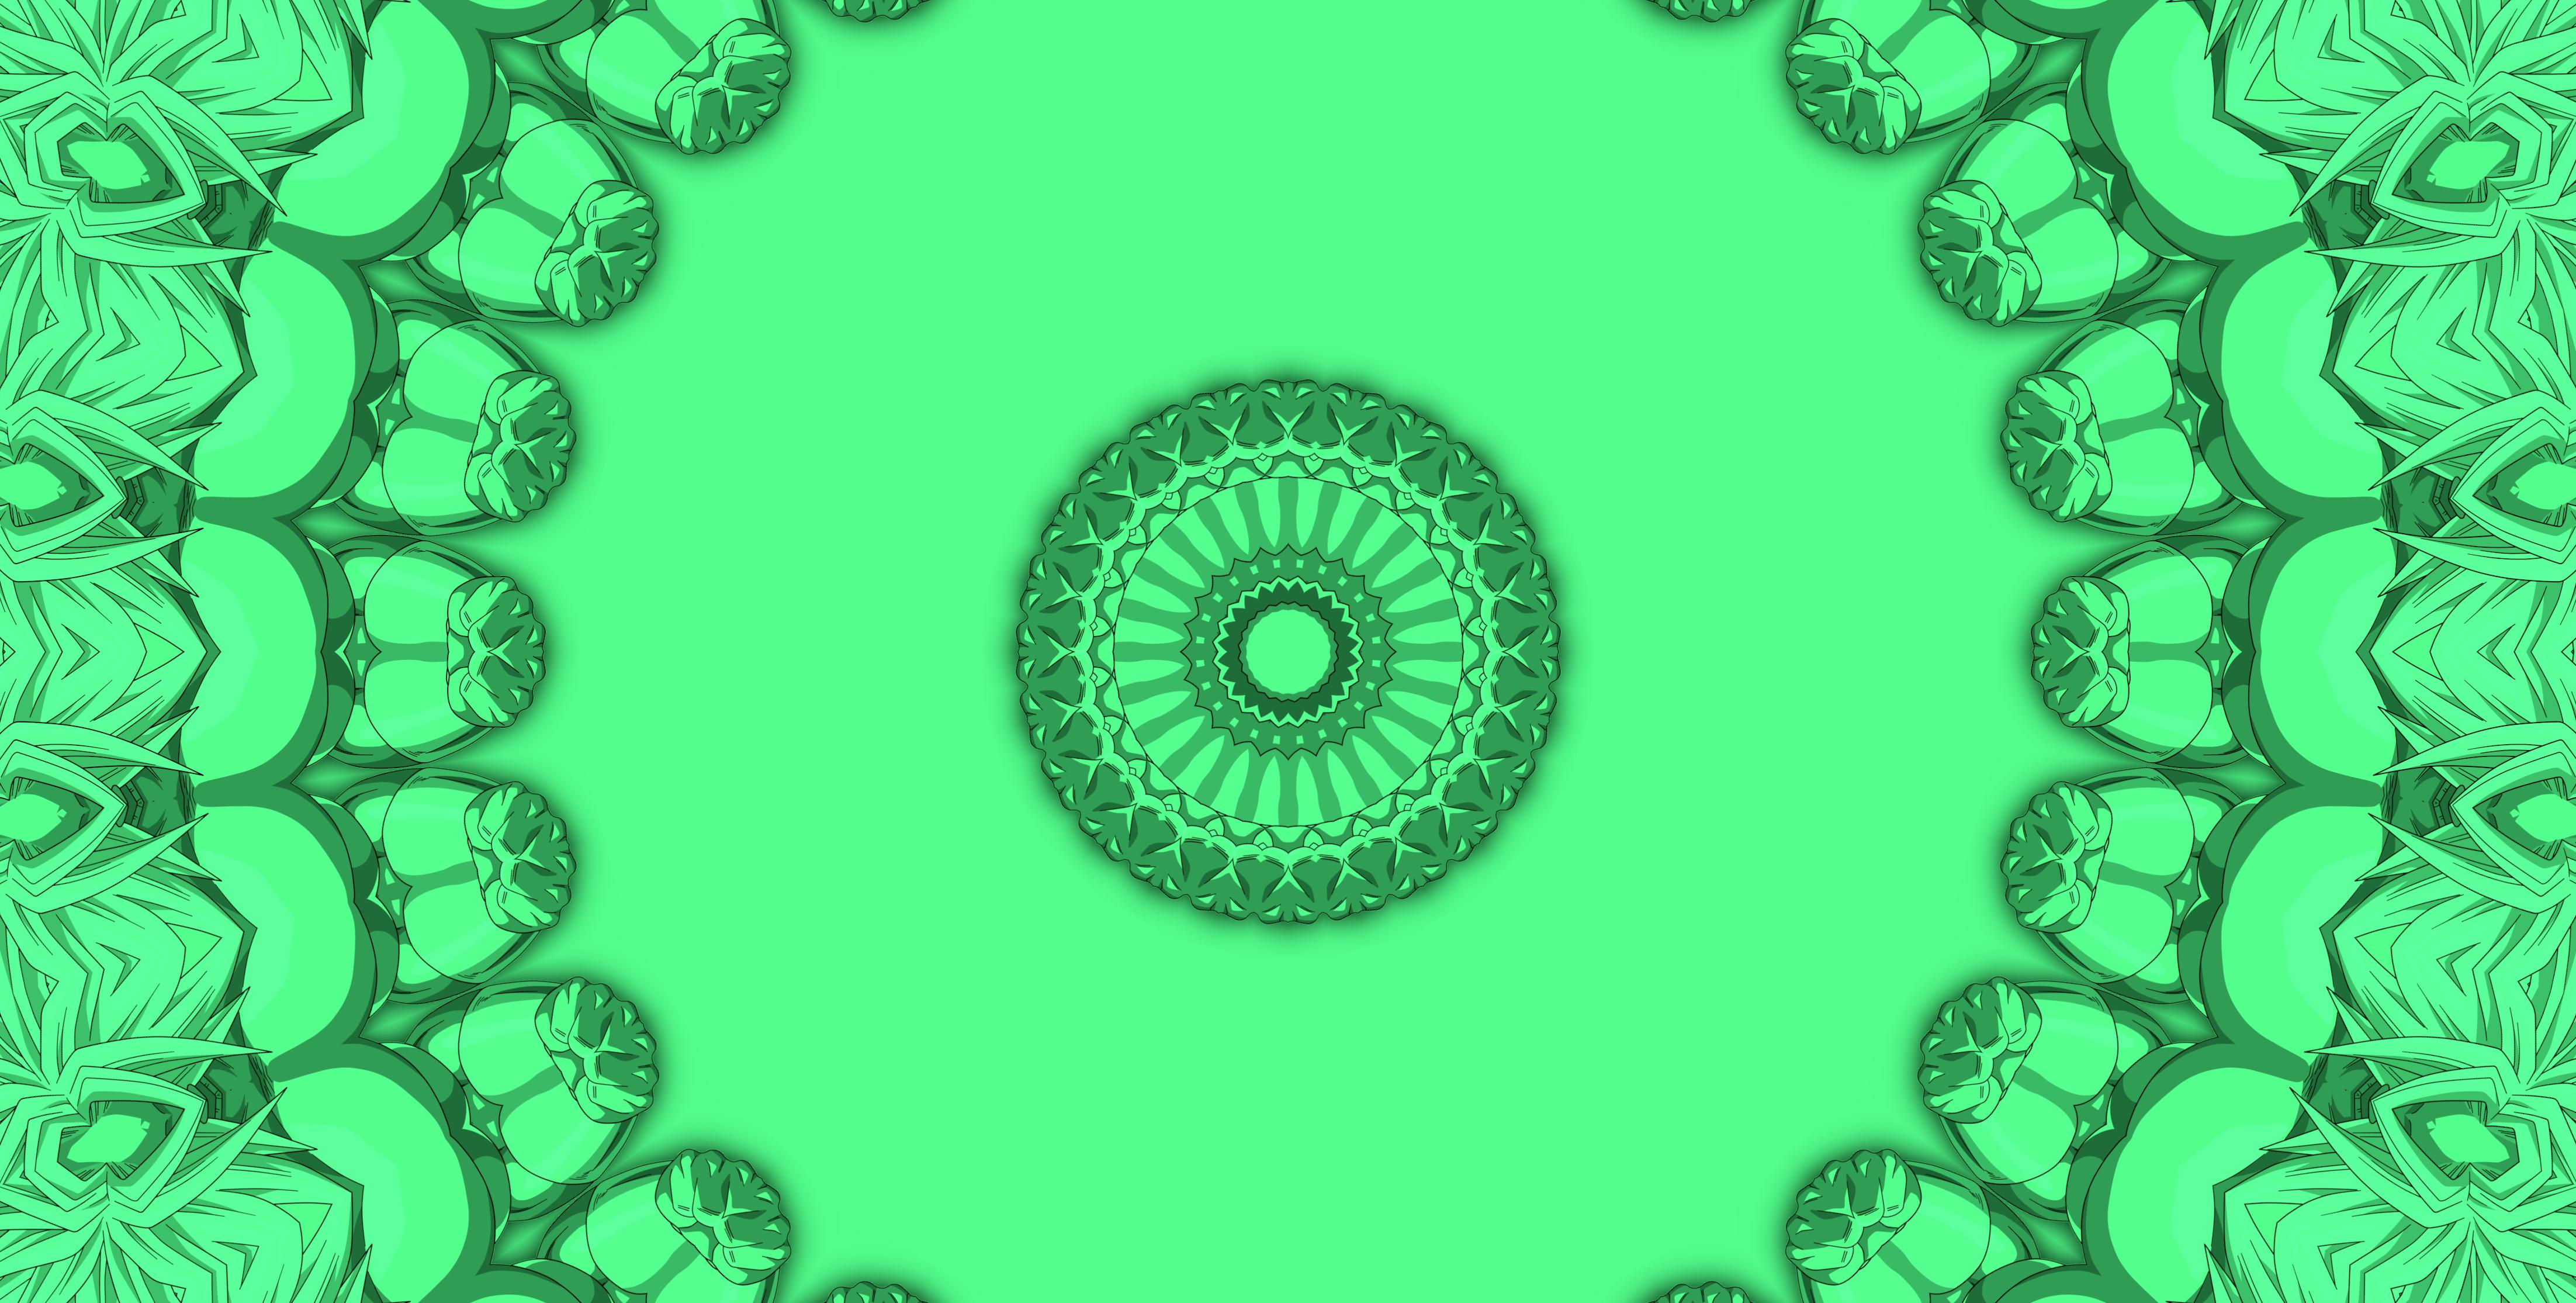 Abstract Artistic Digital Art Kaleidoscope Pattern 4408x2229